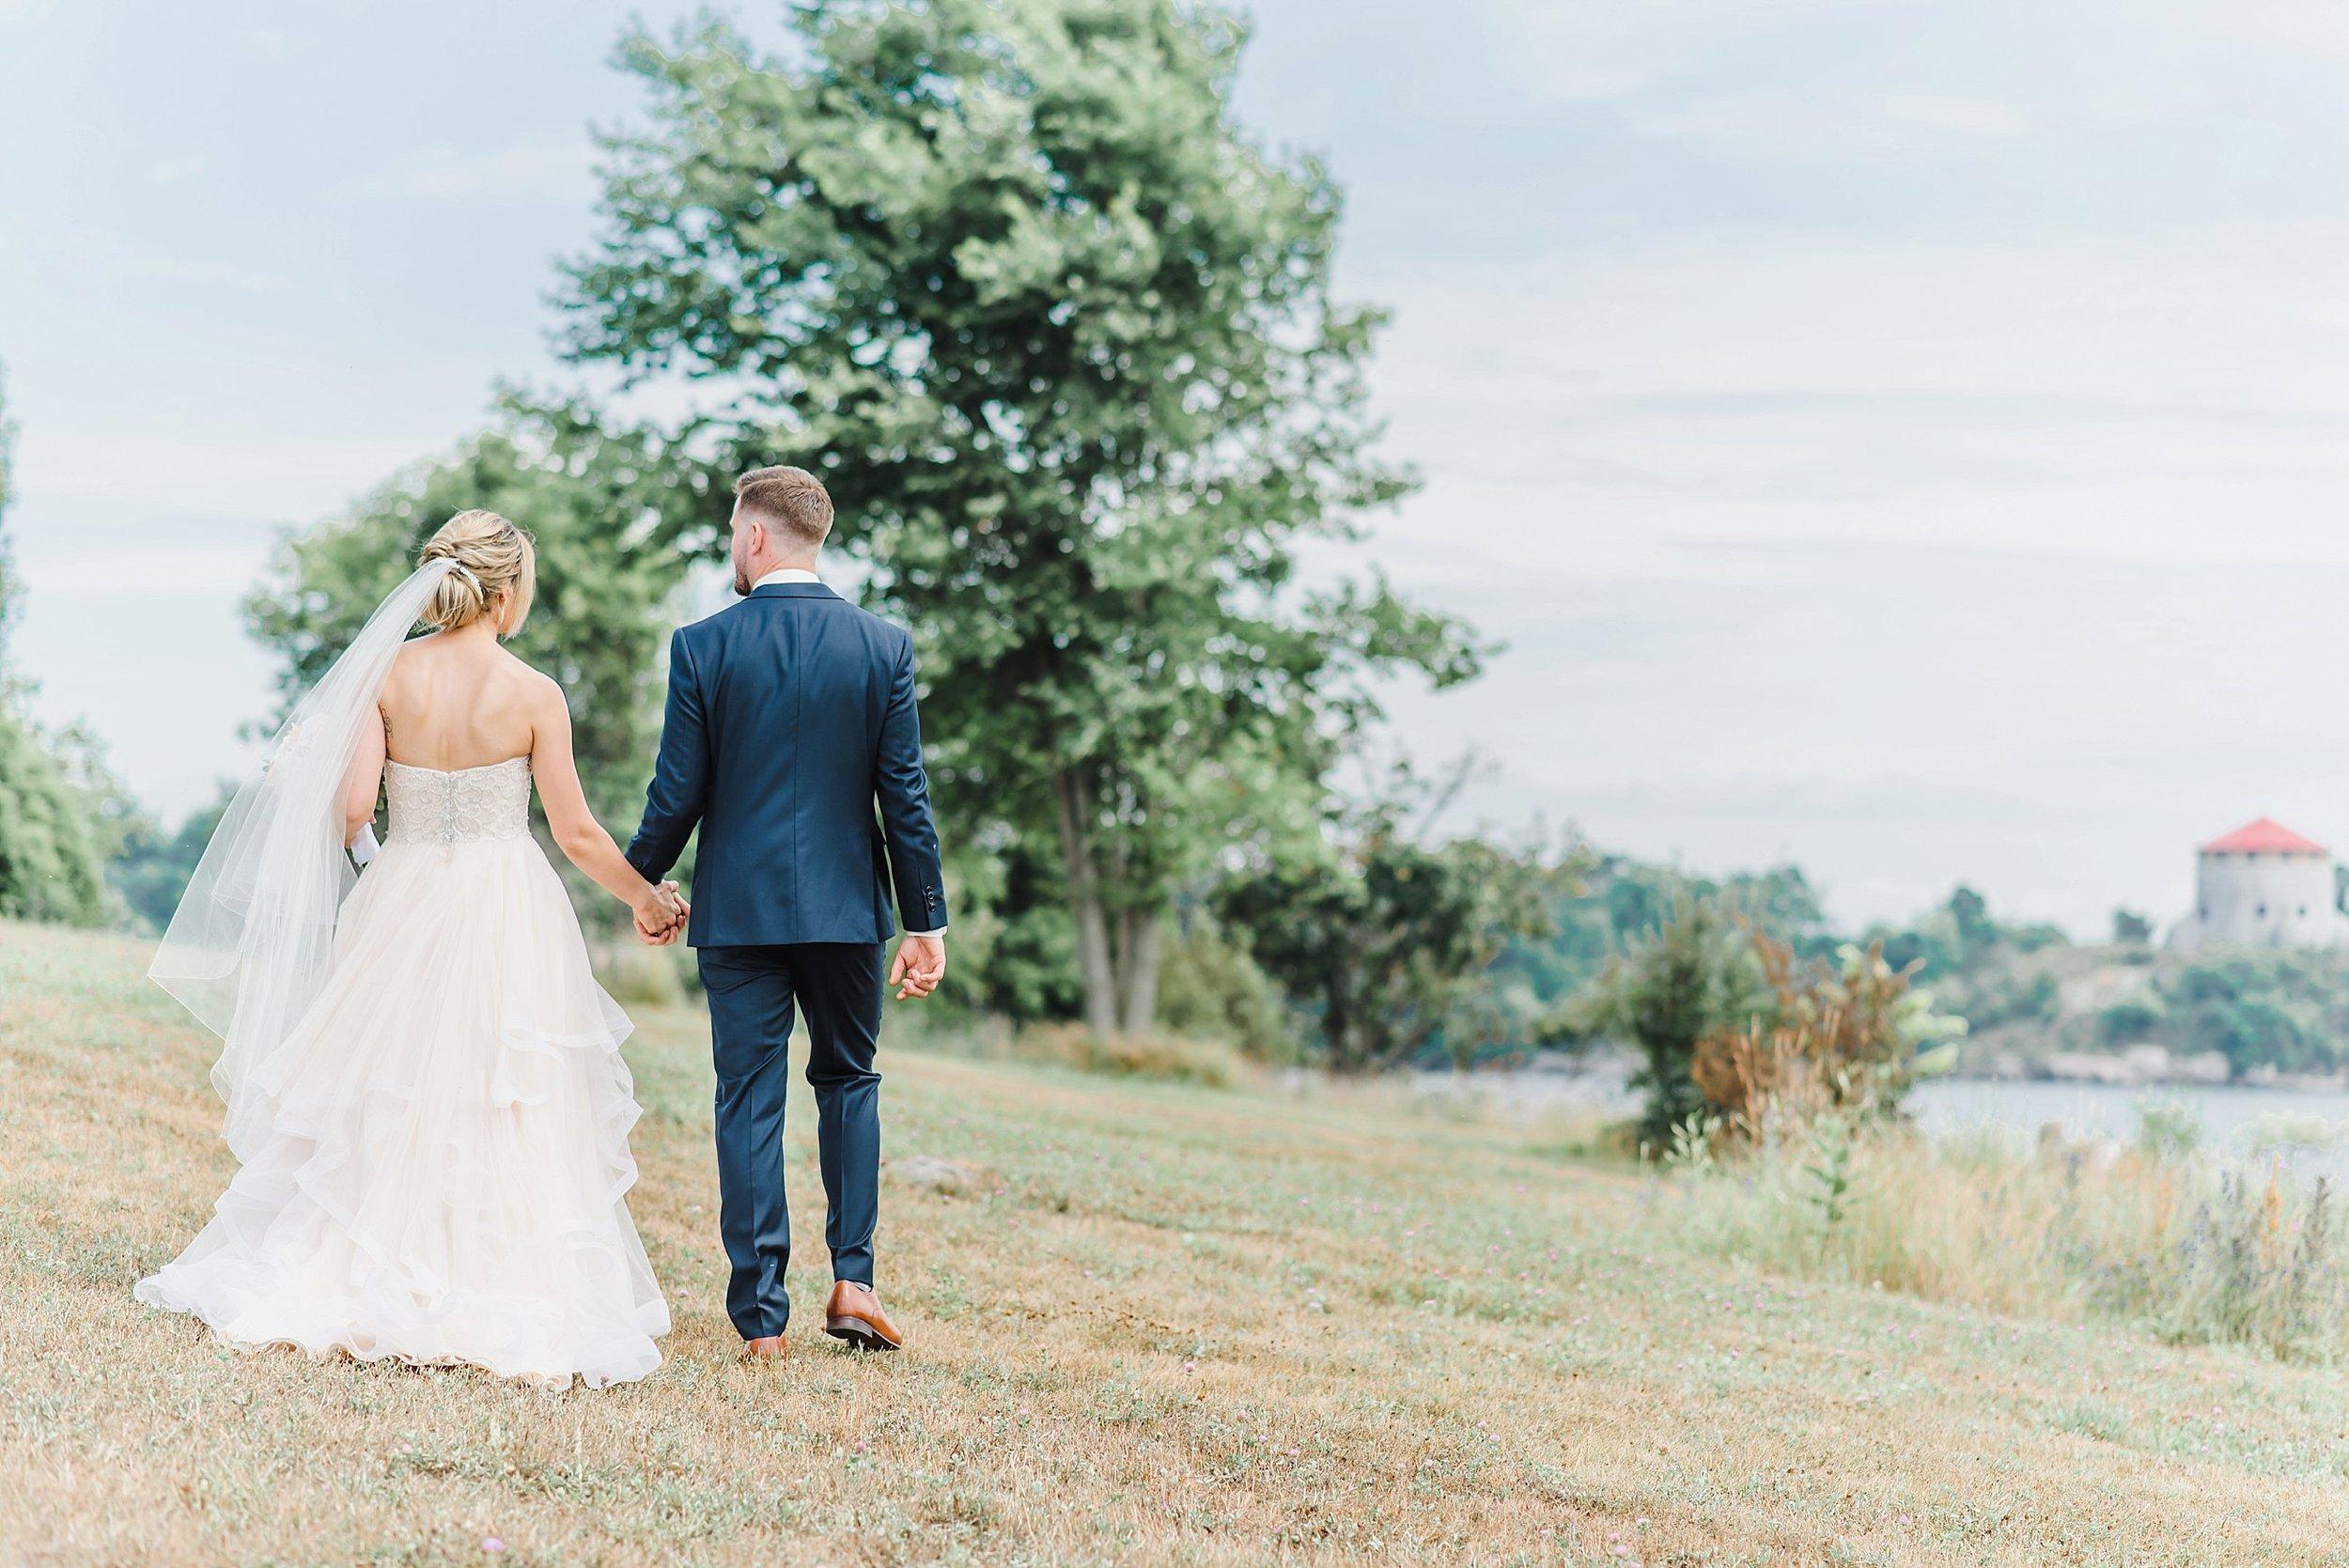 light airy indie fine art ottawa wedding photographer | Ali and Batoul Photography_0163.jpg